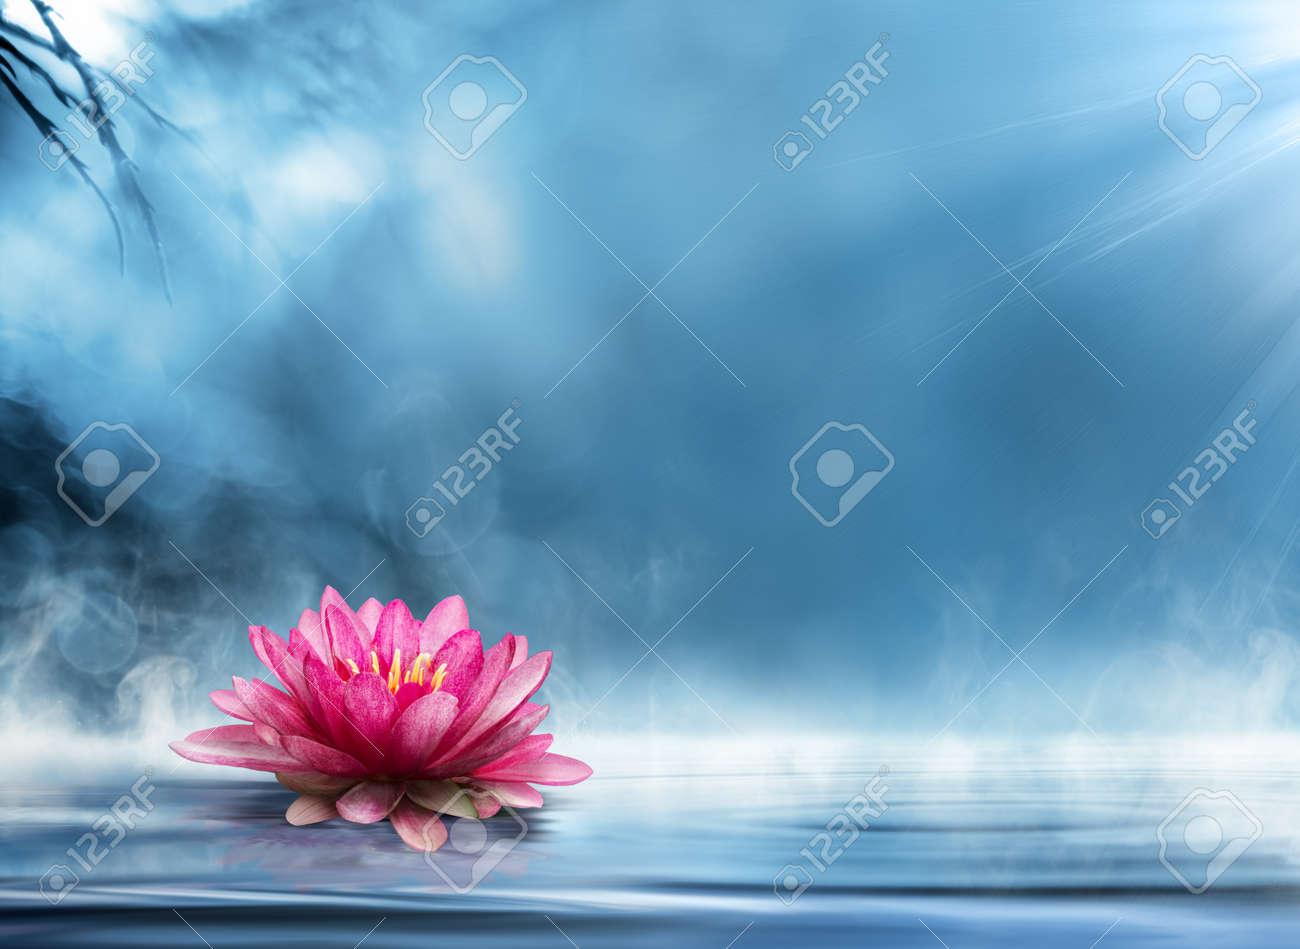 spirituality zen in peaceful scenery - 36509565